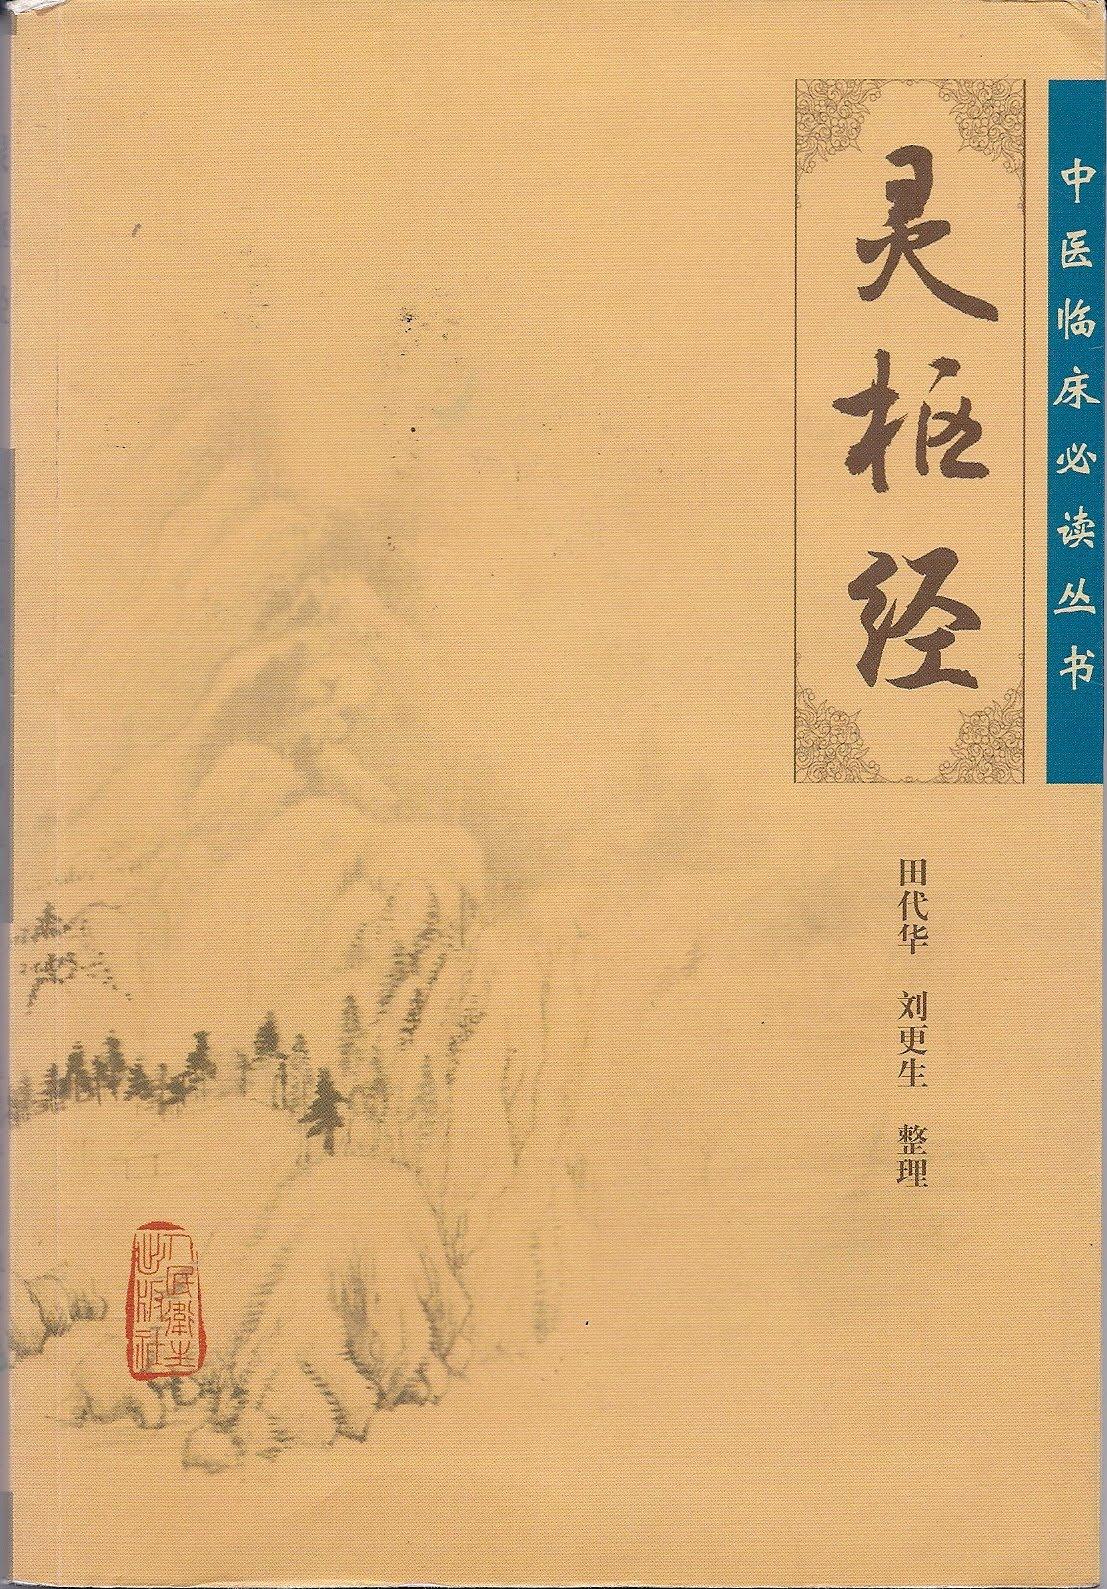 Download PDF Ling Shu Or the Spiritual Pivot by Wu Jing-Nuan Free Book PDF